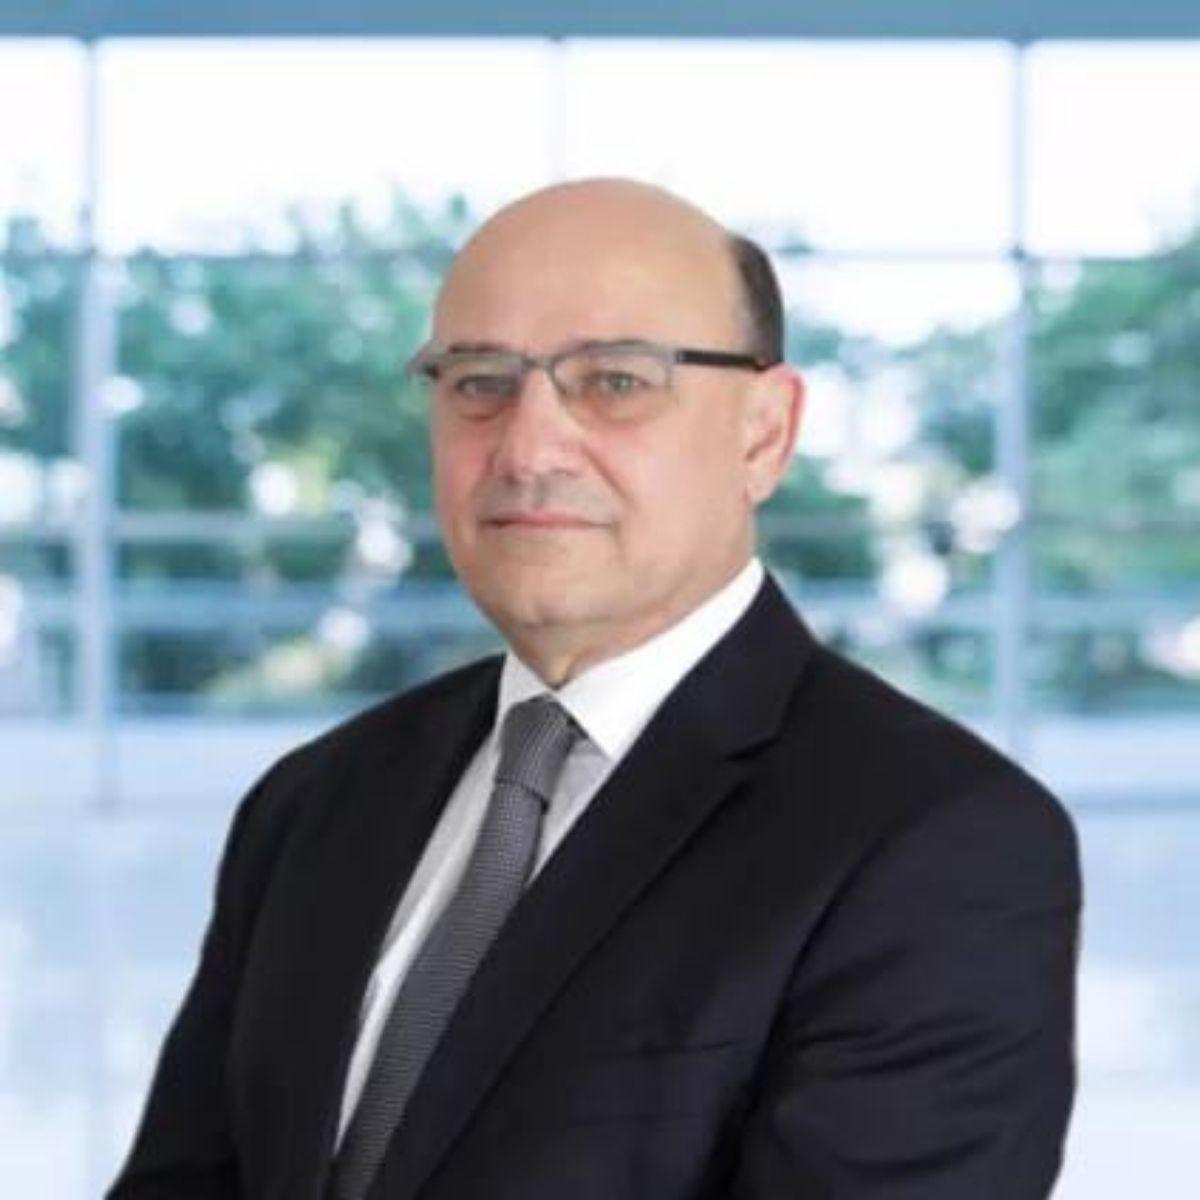 FinanceMalta welcomes Tonio Zarb as new Governor